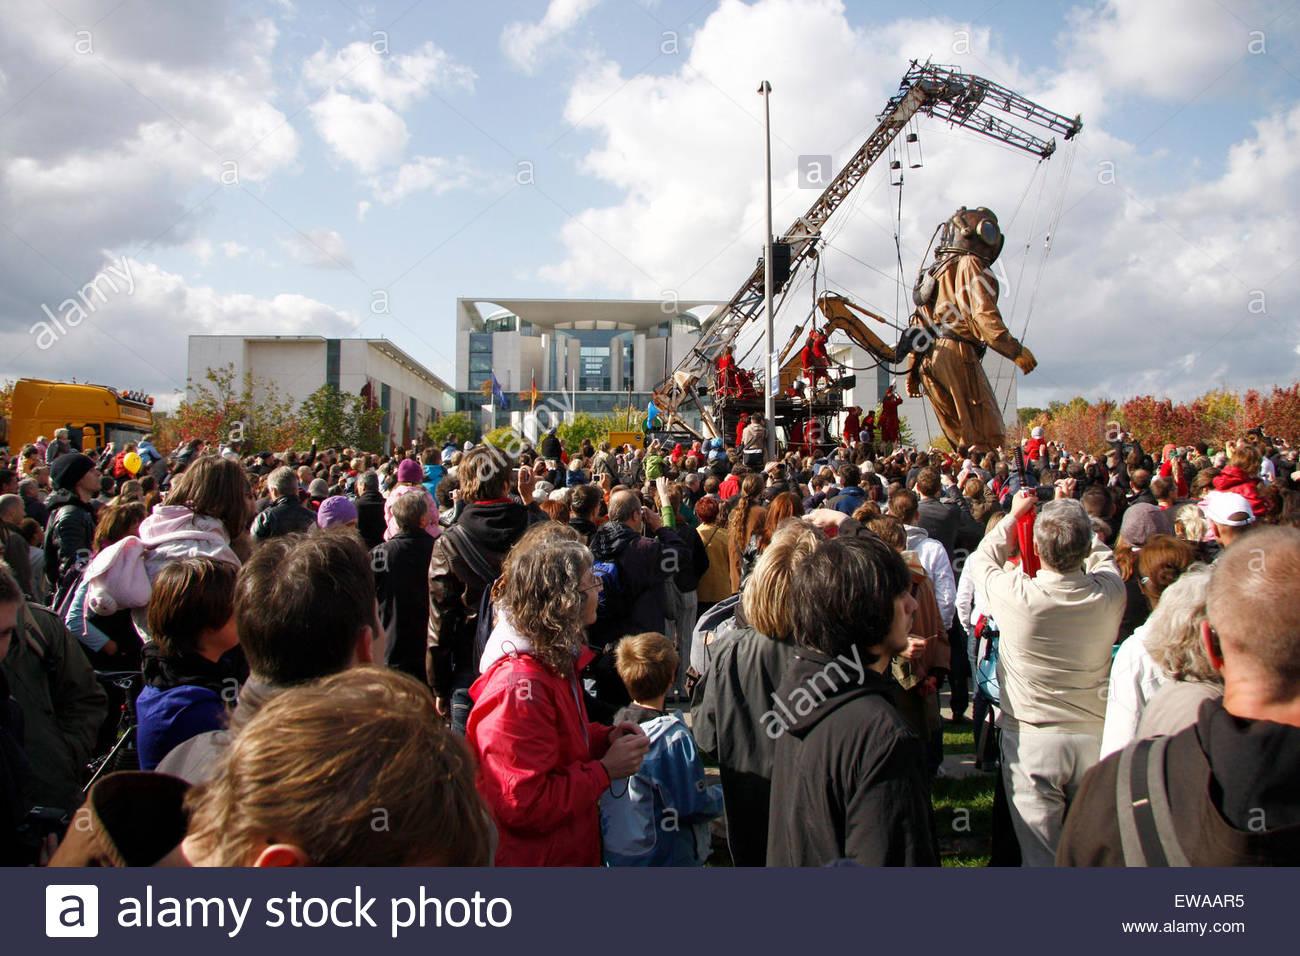 Riese, Bundeskanzleramt - Riesentheaterperformace 'LE RENDEZ-VOUS DE BERLIN DAS WIEDERSEHEN VON BERLIN' - Stock Image